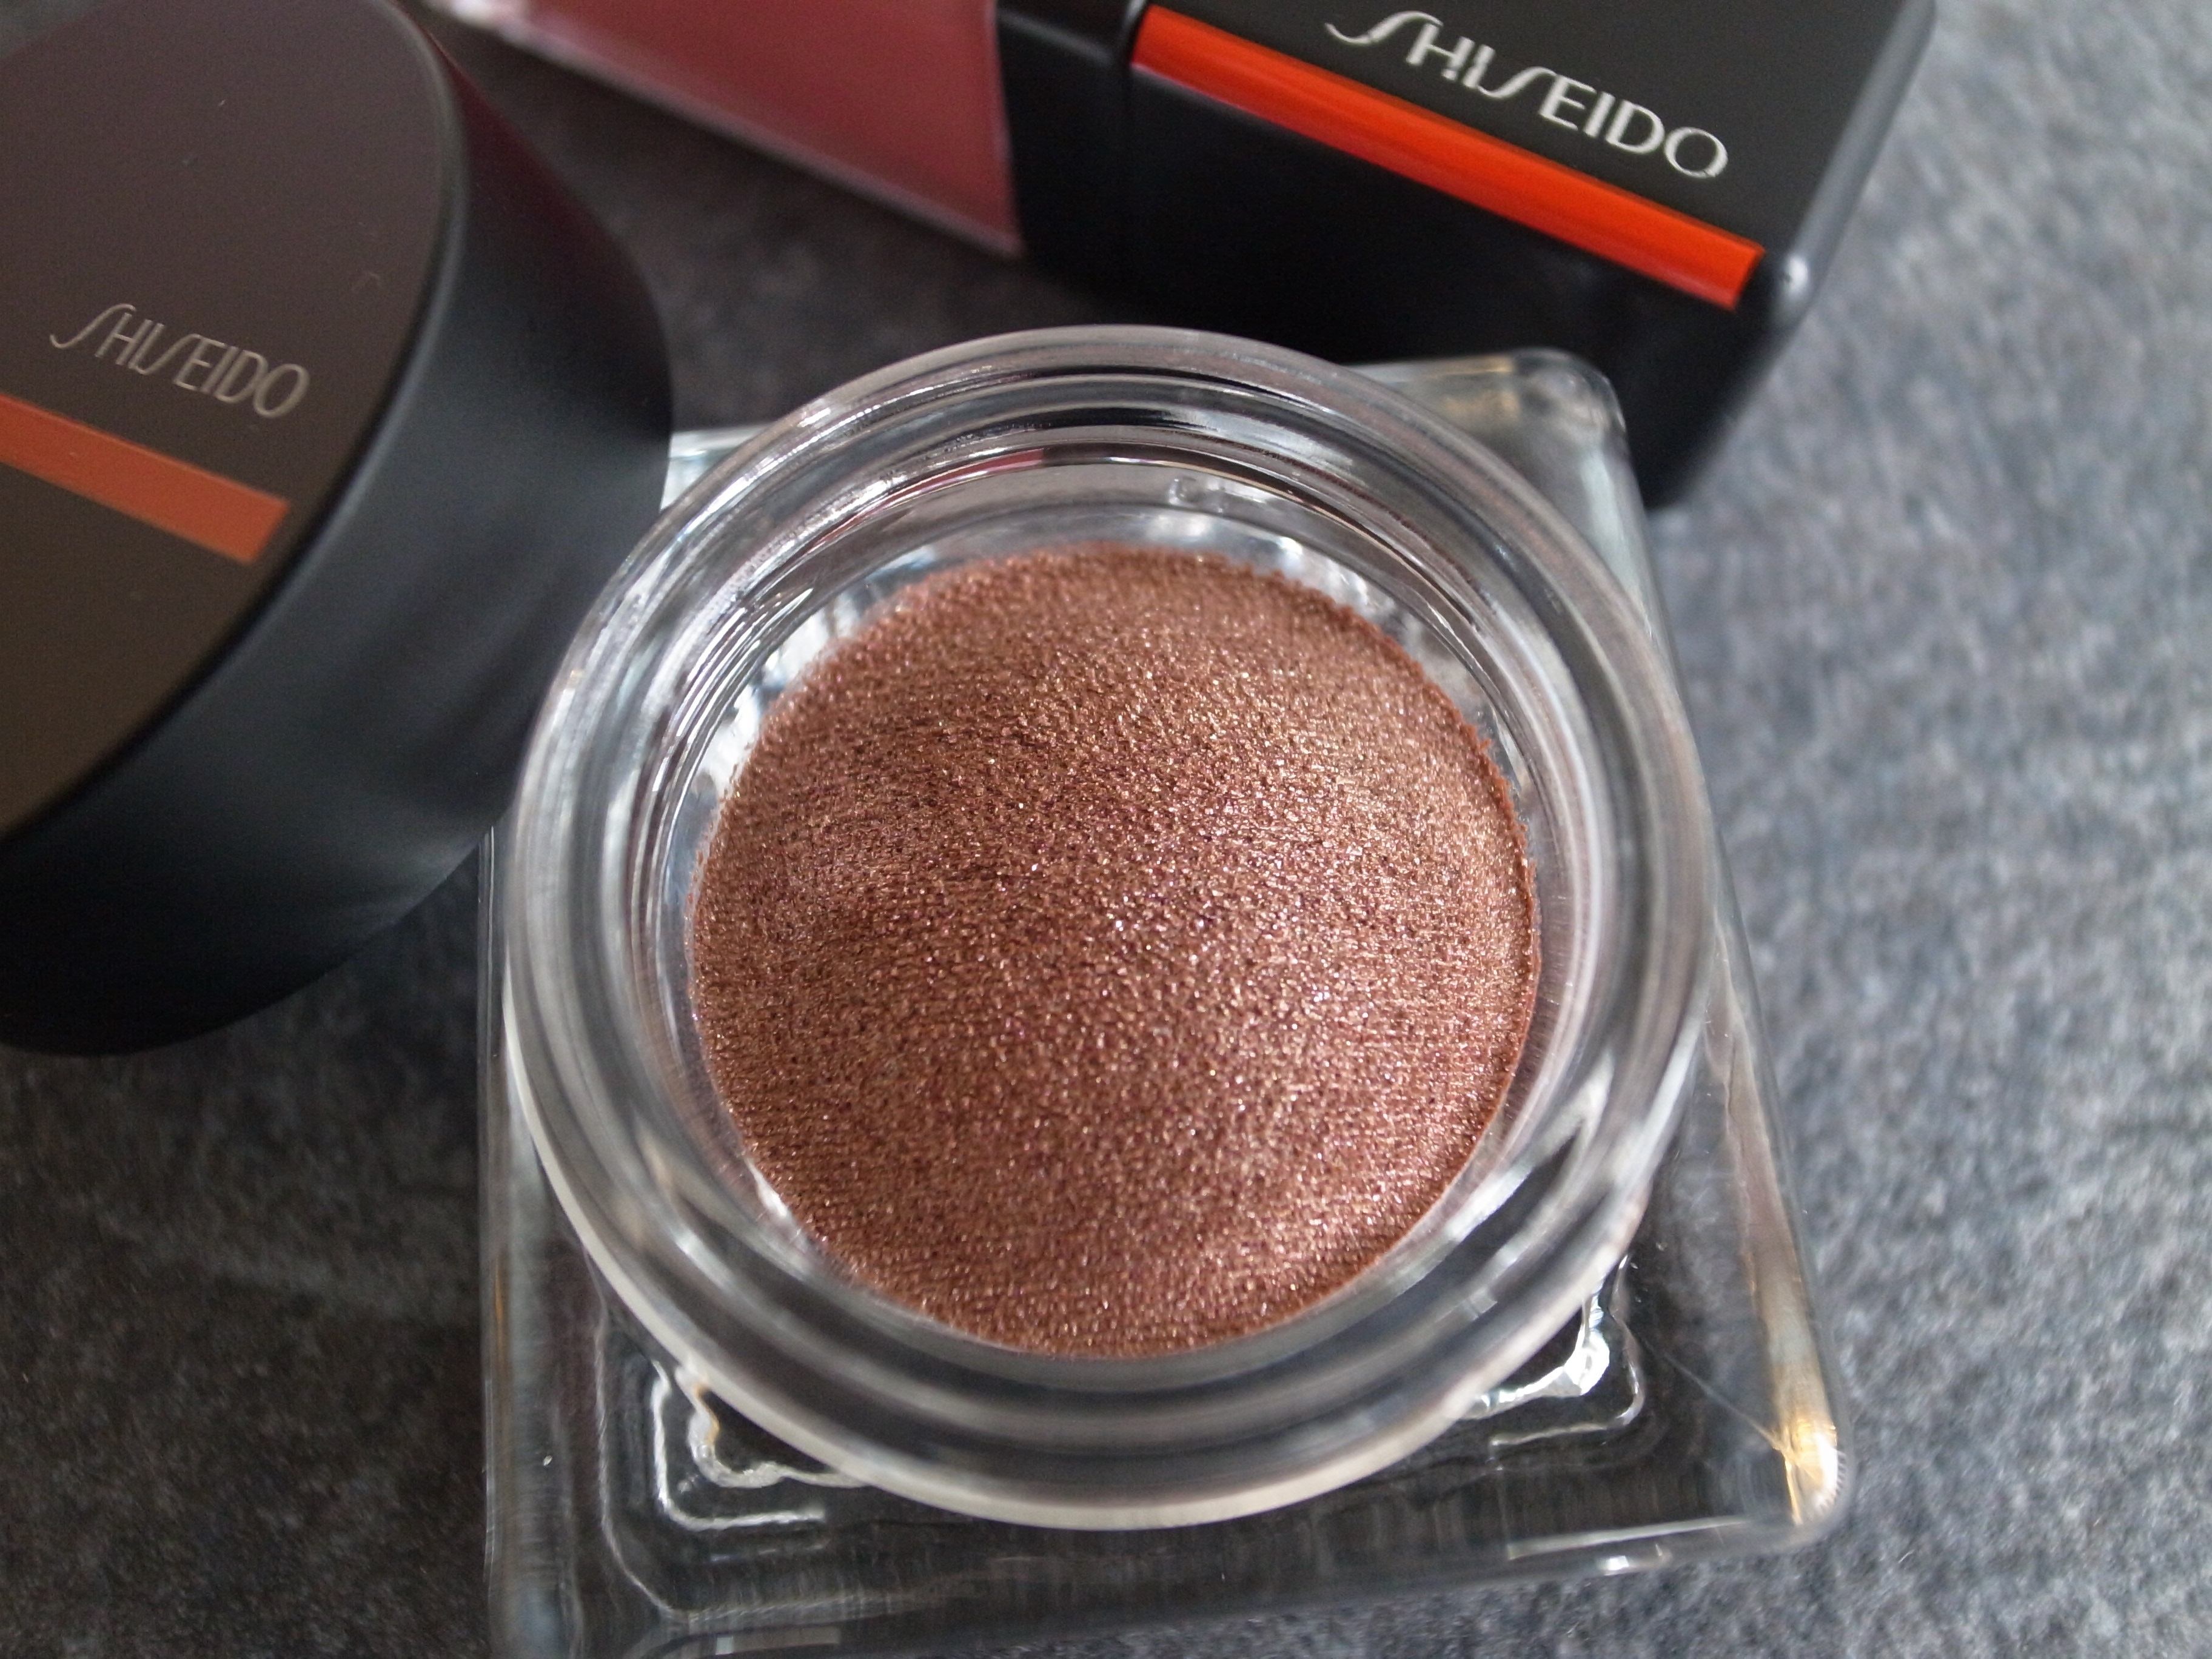 Shiseido Dews, Shiseido LacquerInk Lip Shine